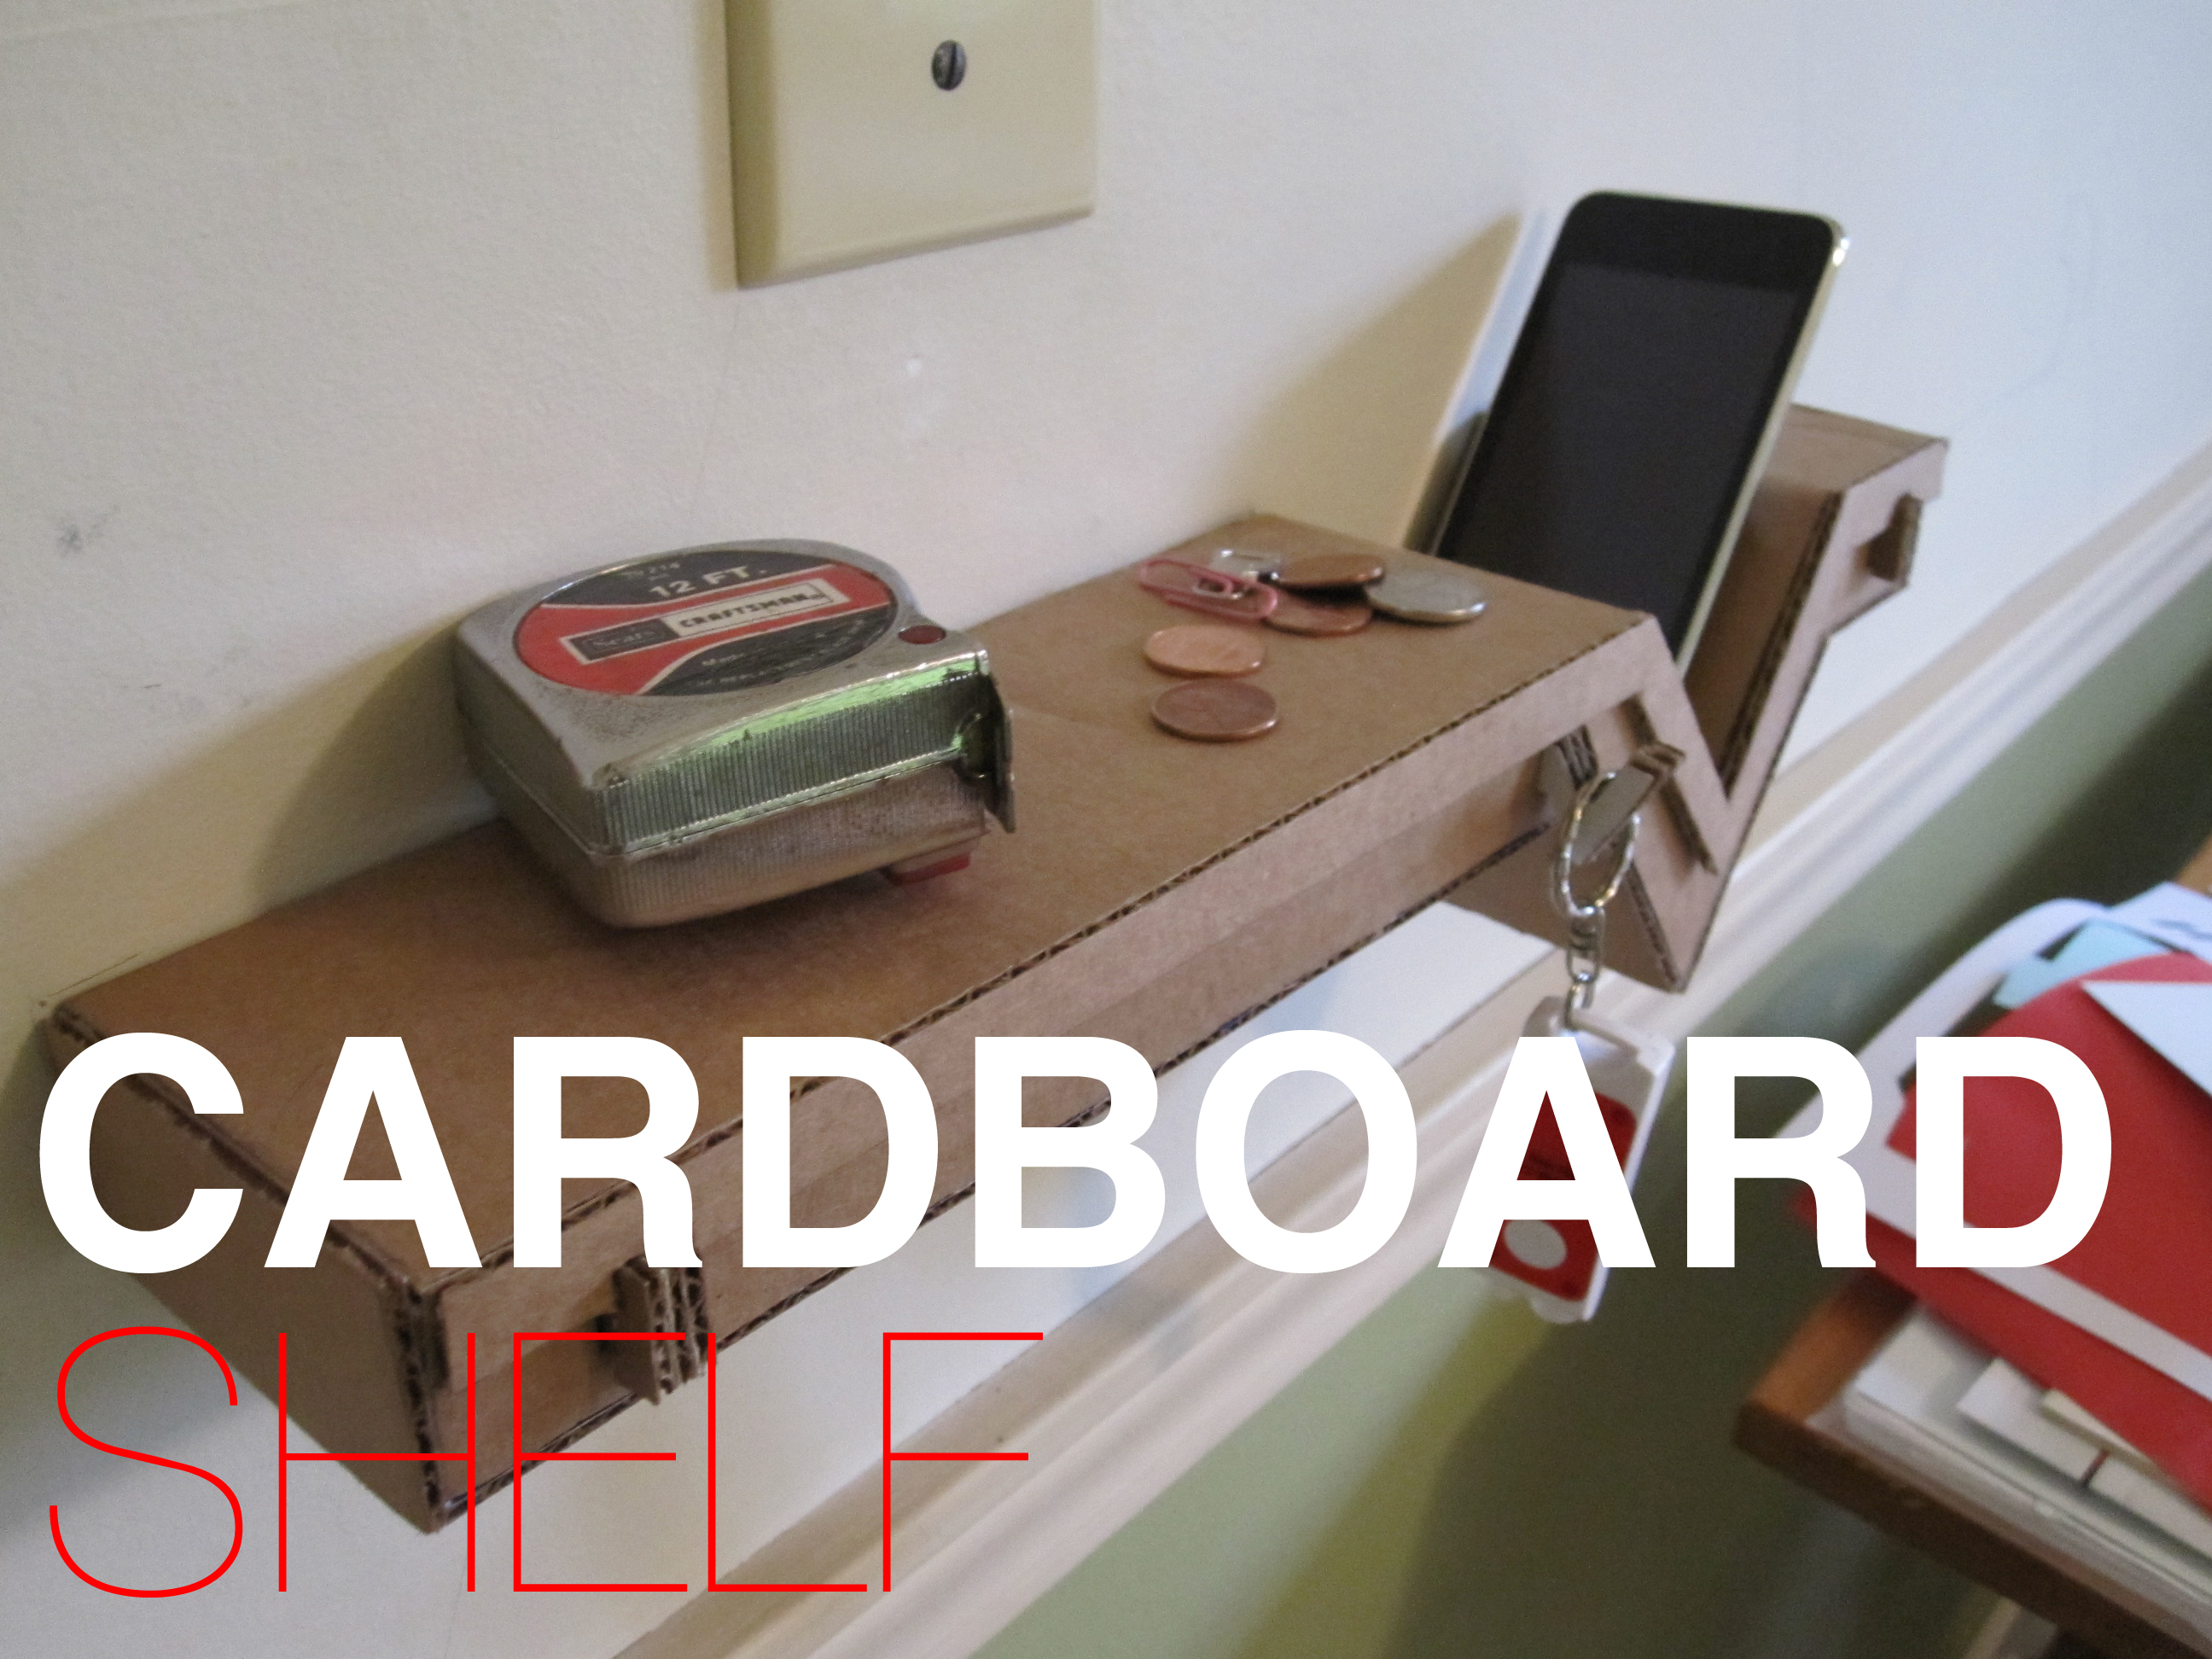 Amazing Cardboard Shelf!